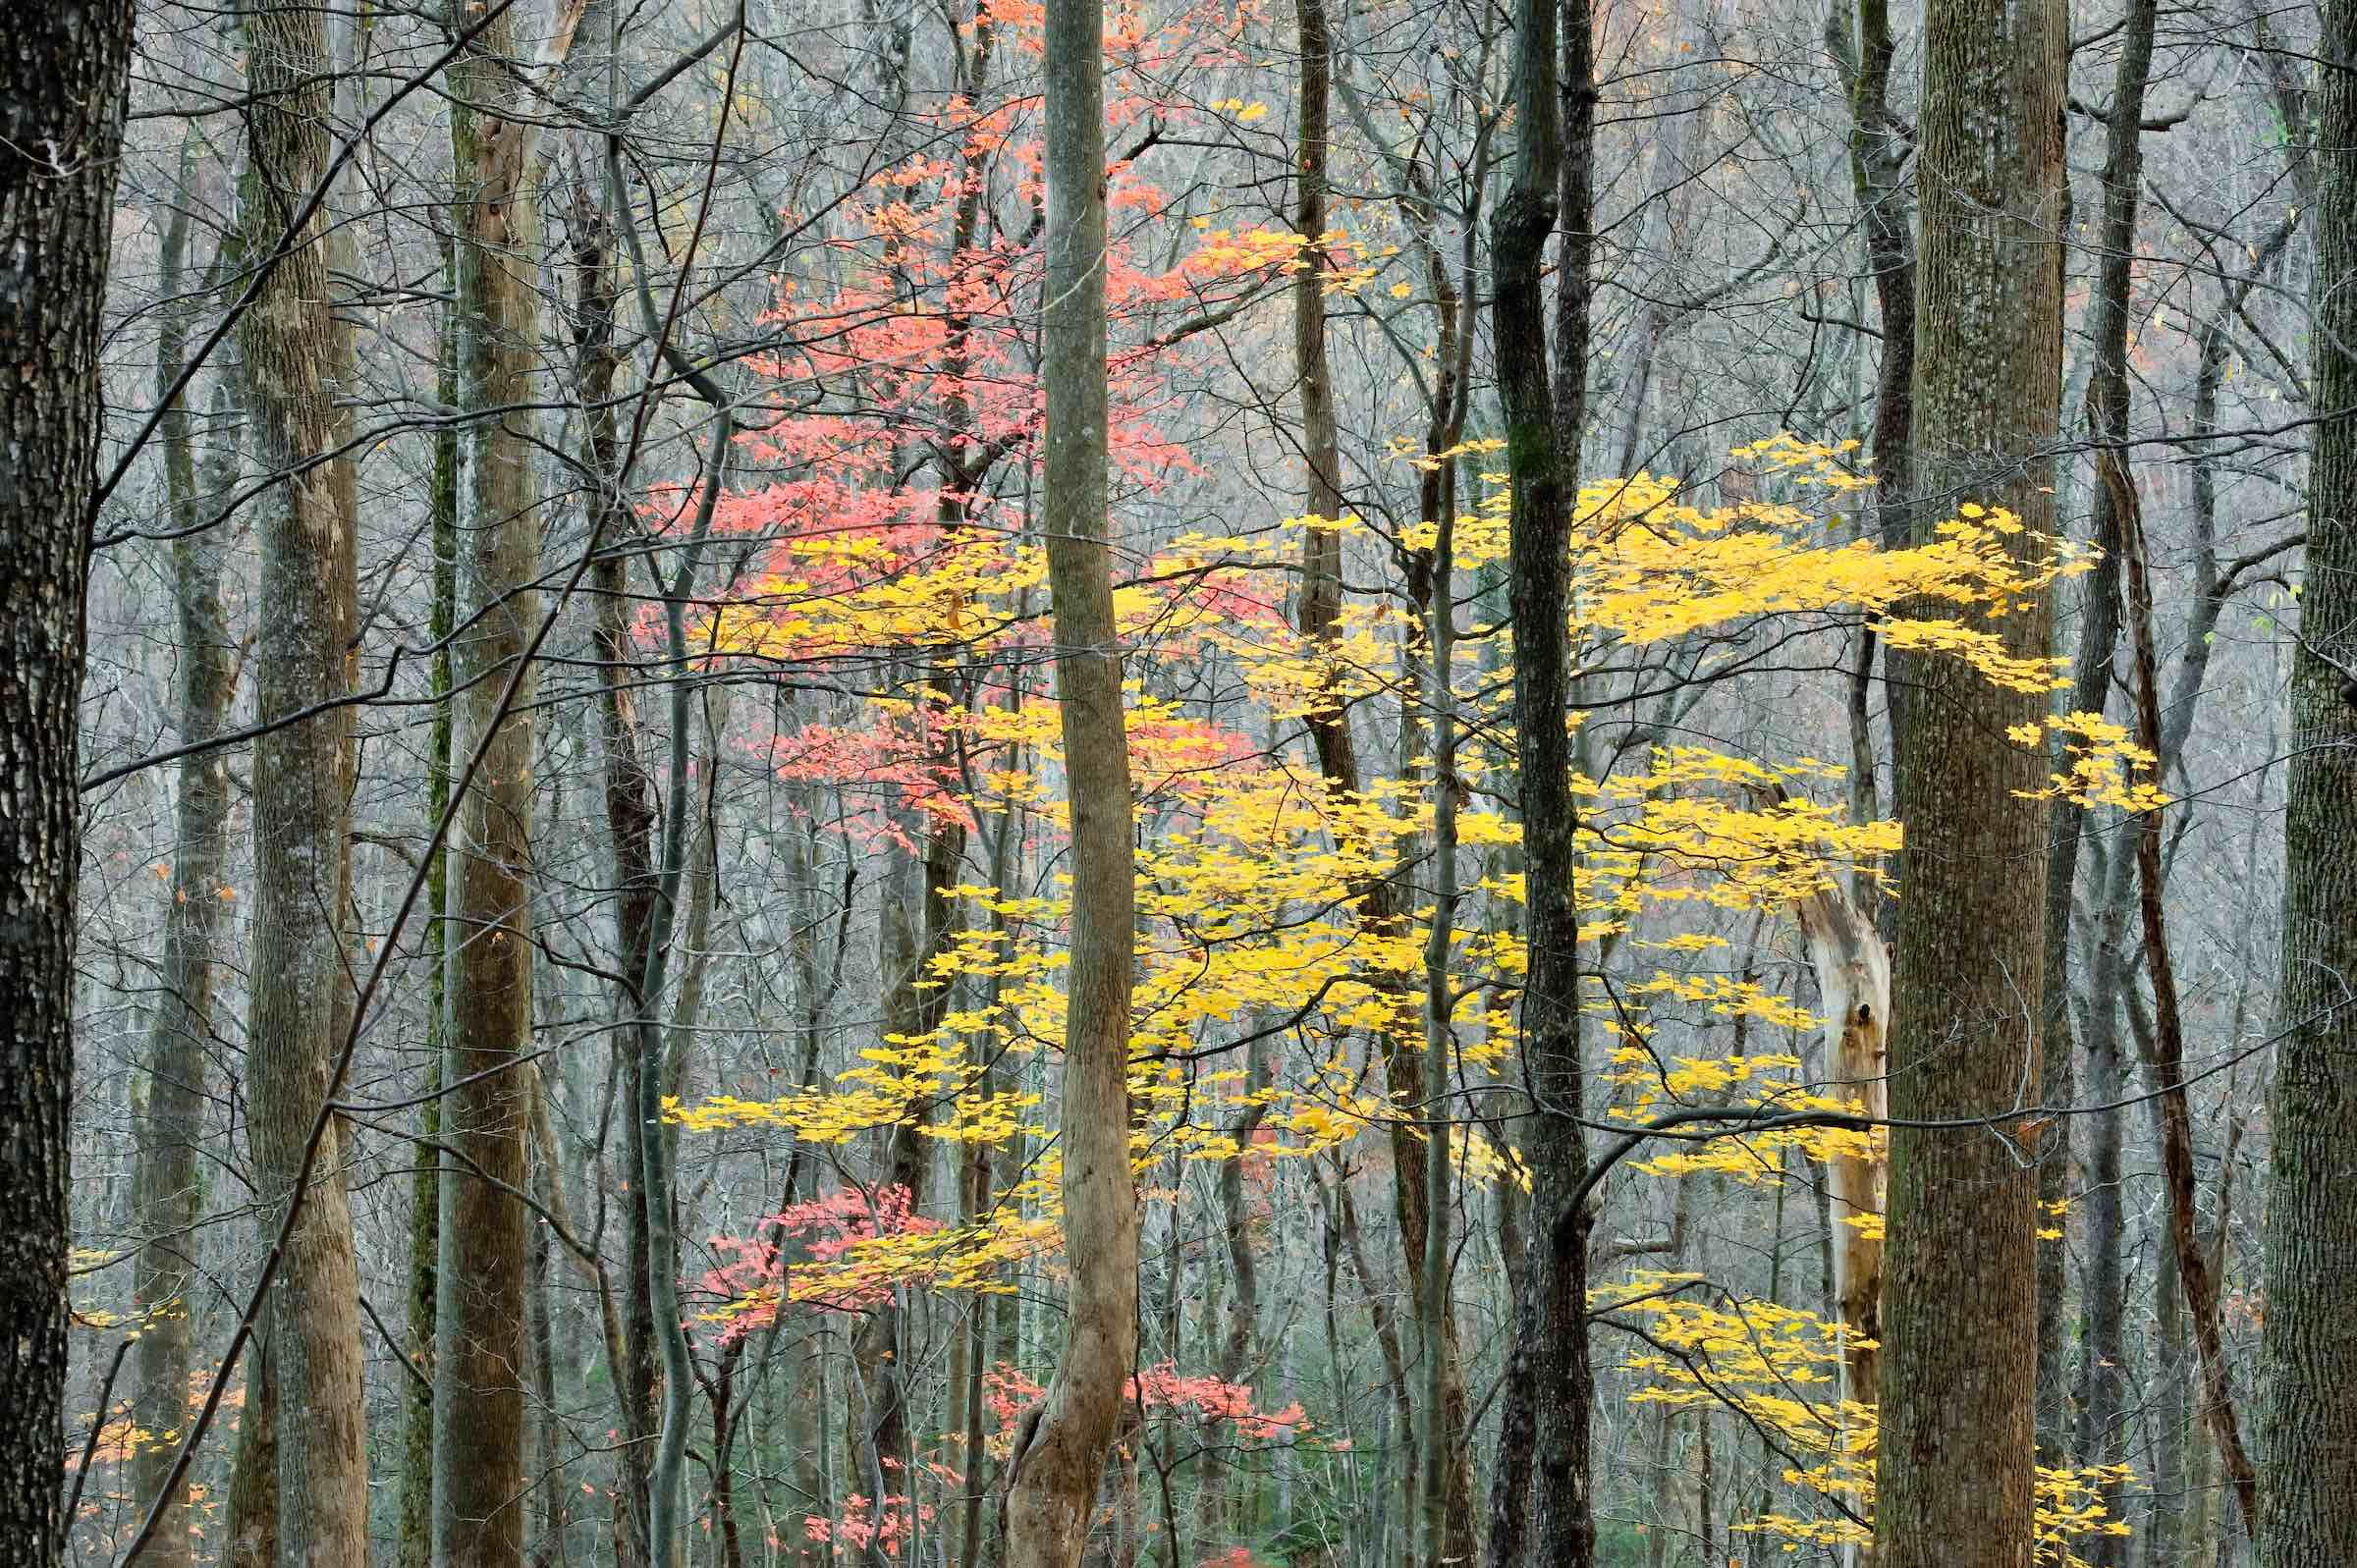 AutumnHardwoodForestsmokymt.NP K16-12M.jpg